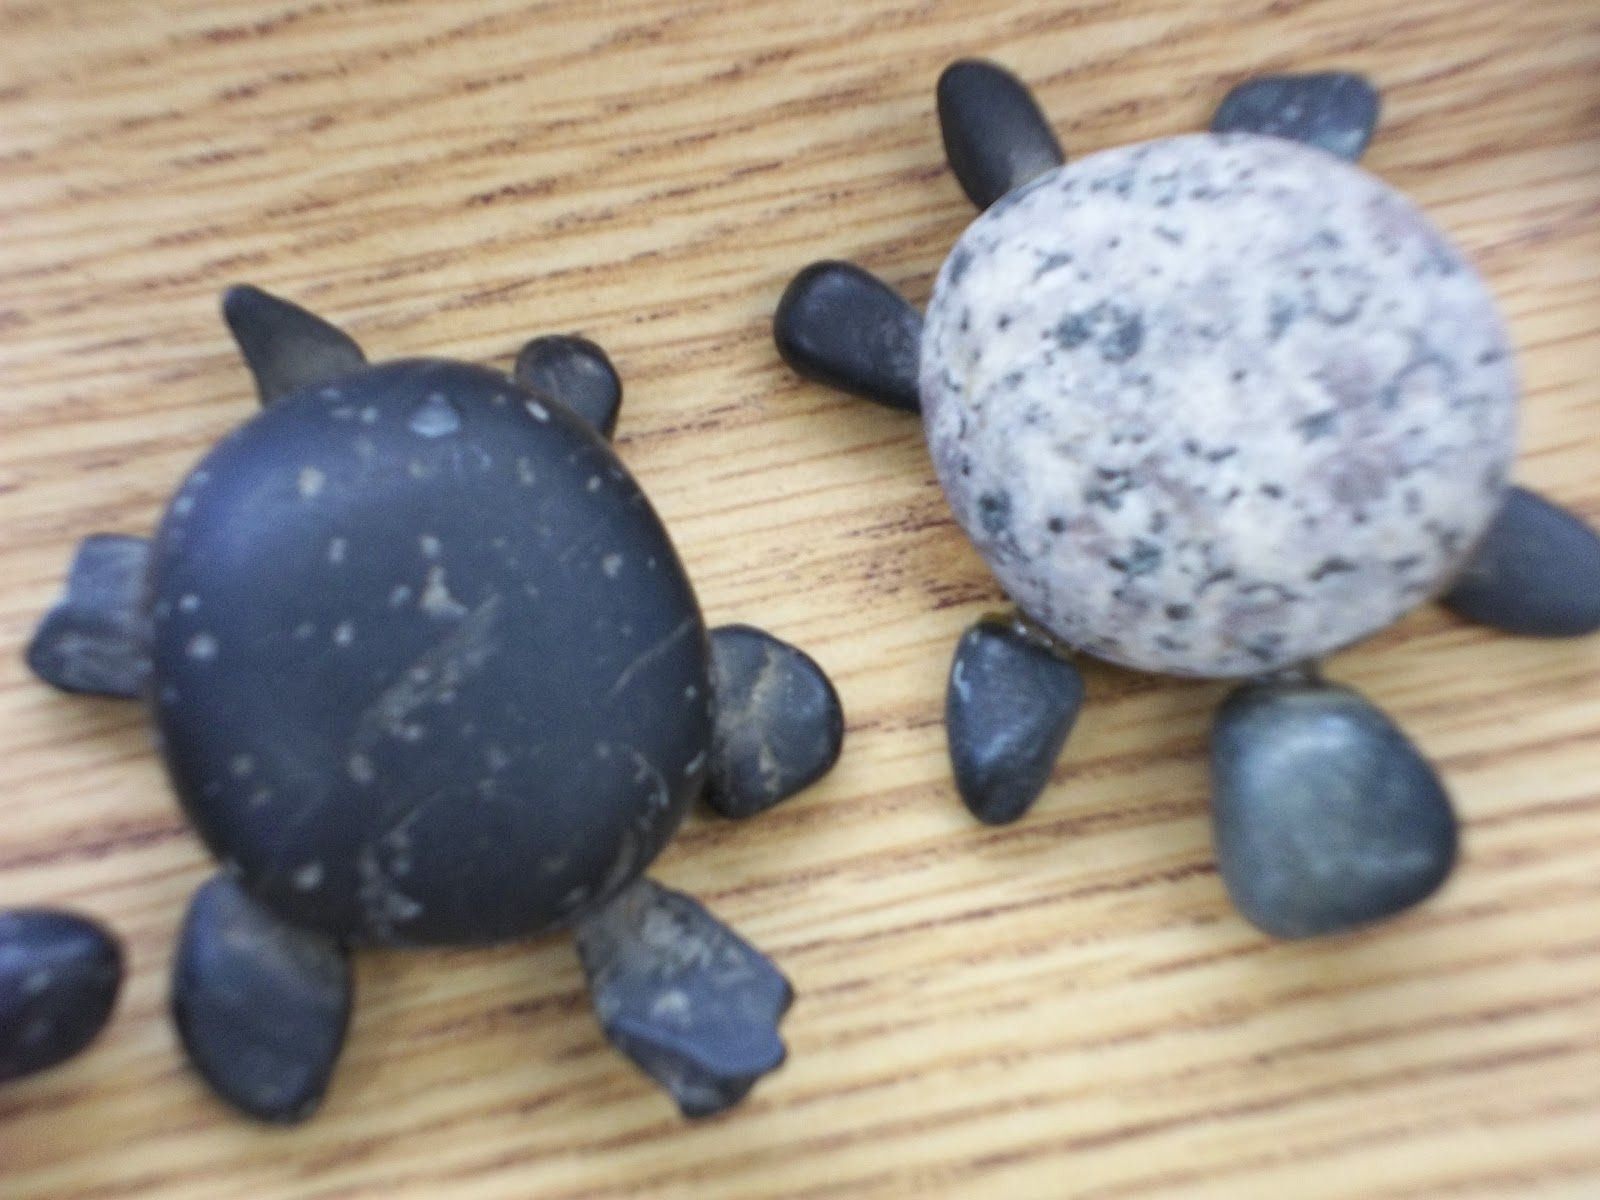 The Rosamond Lane Lord Fund Turtle Art